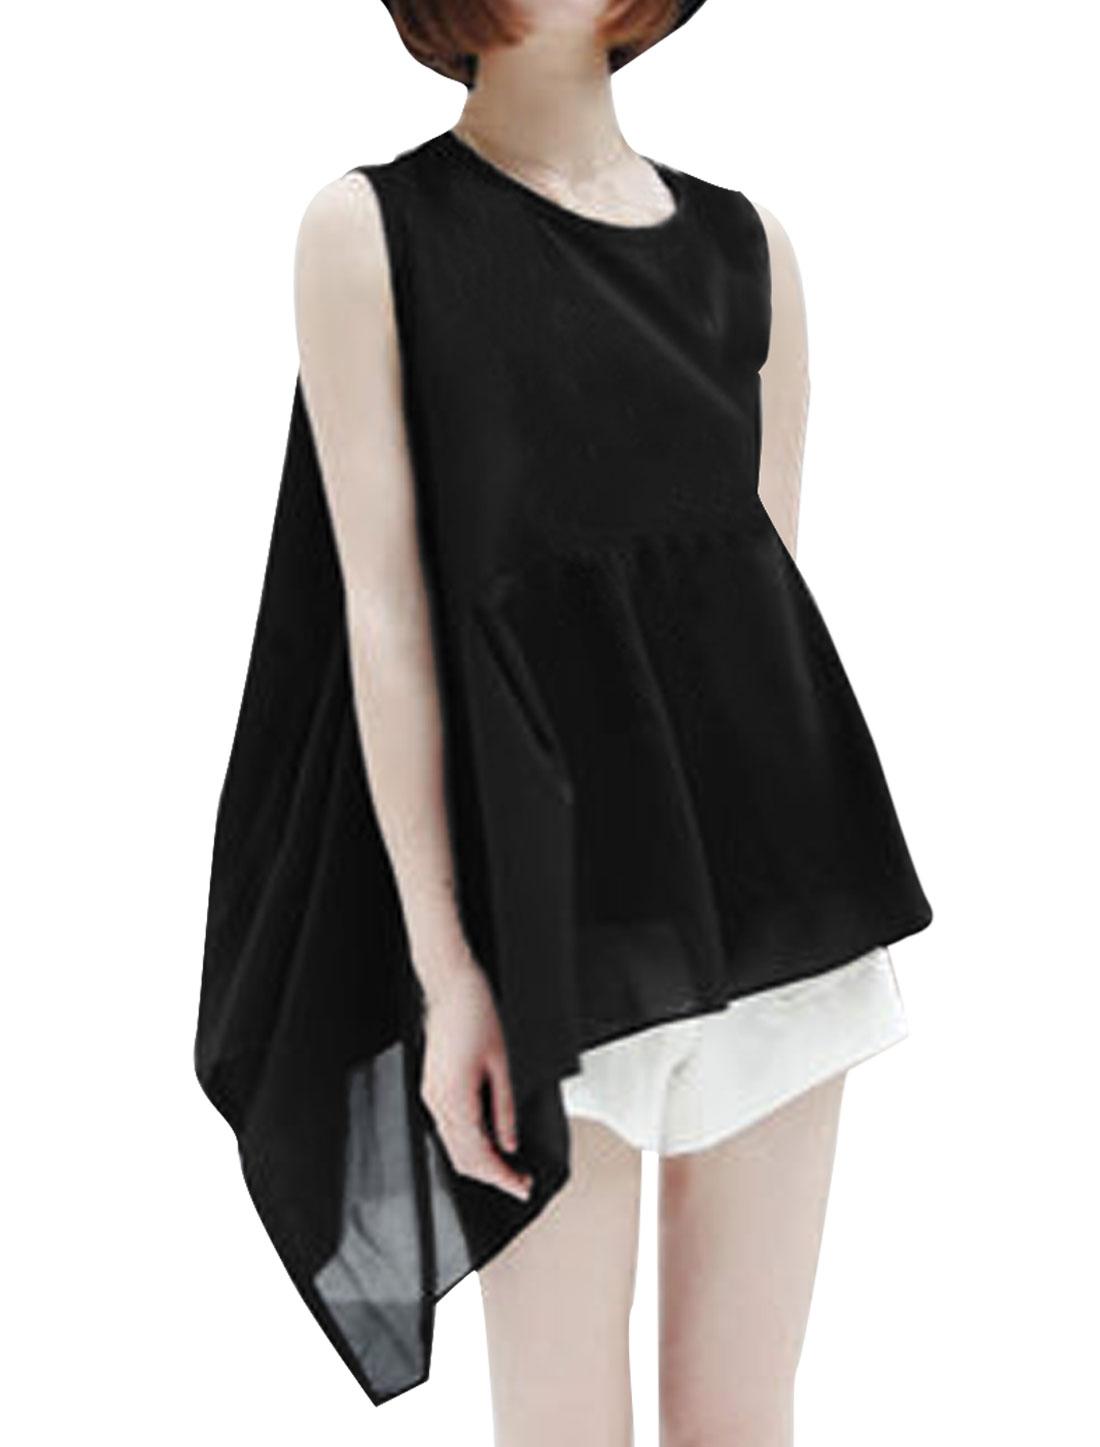 Ladies New Fashion Irregular Hem Chiffon Splice Black Peplum Tops S